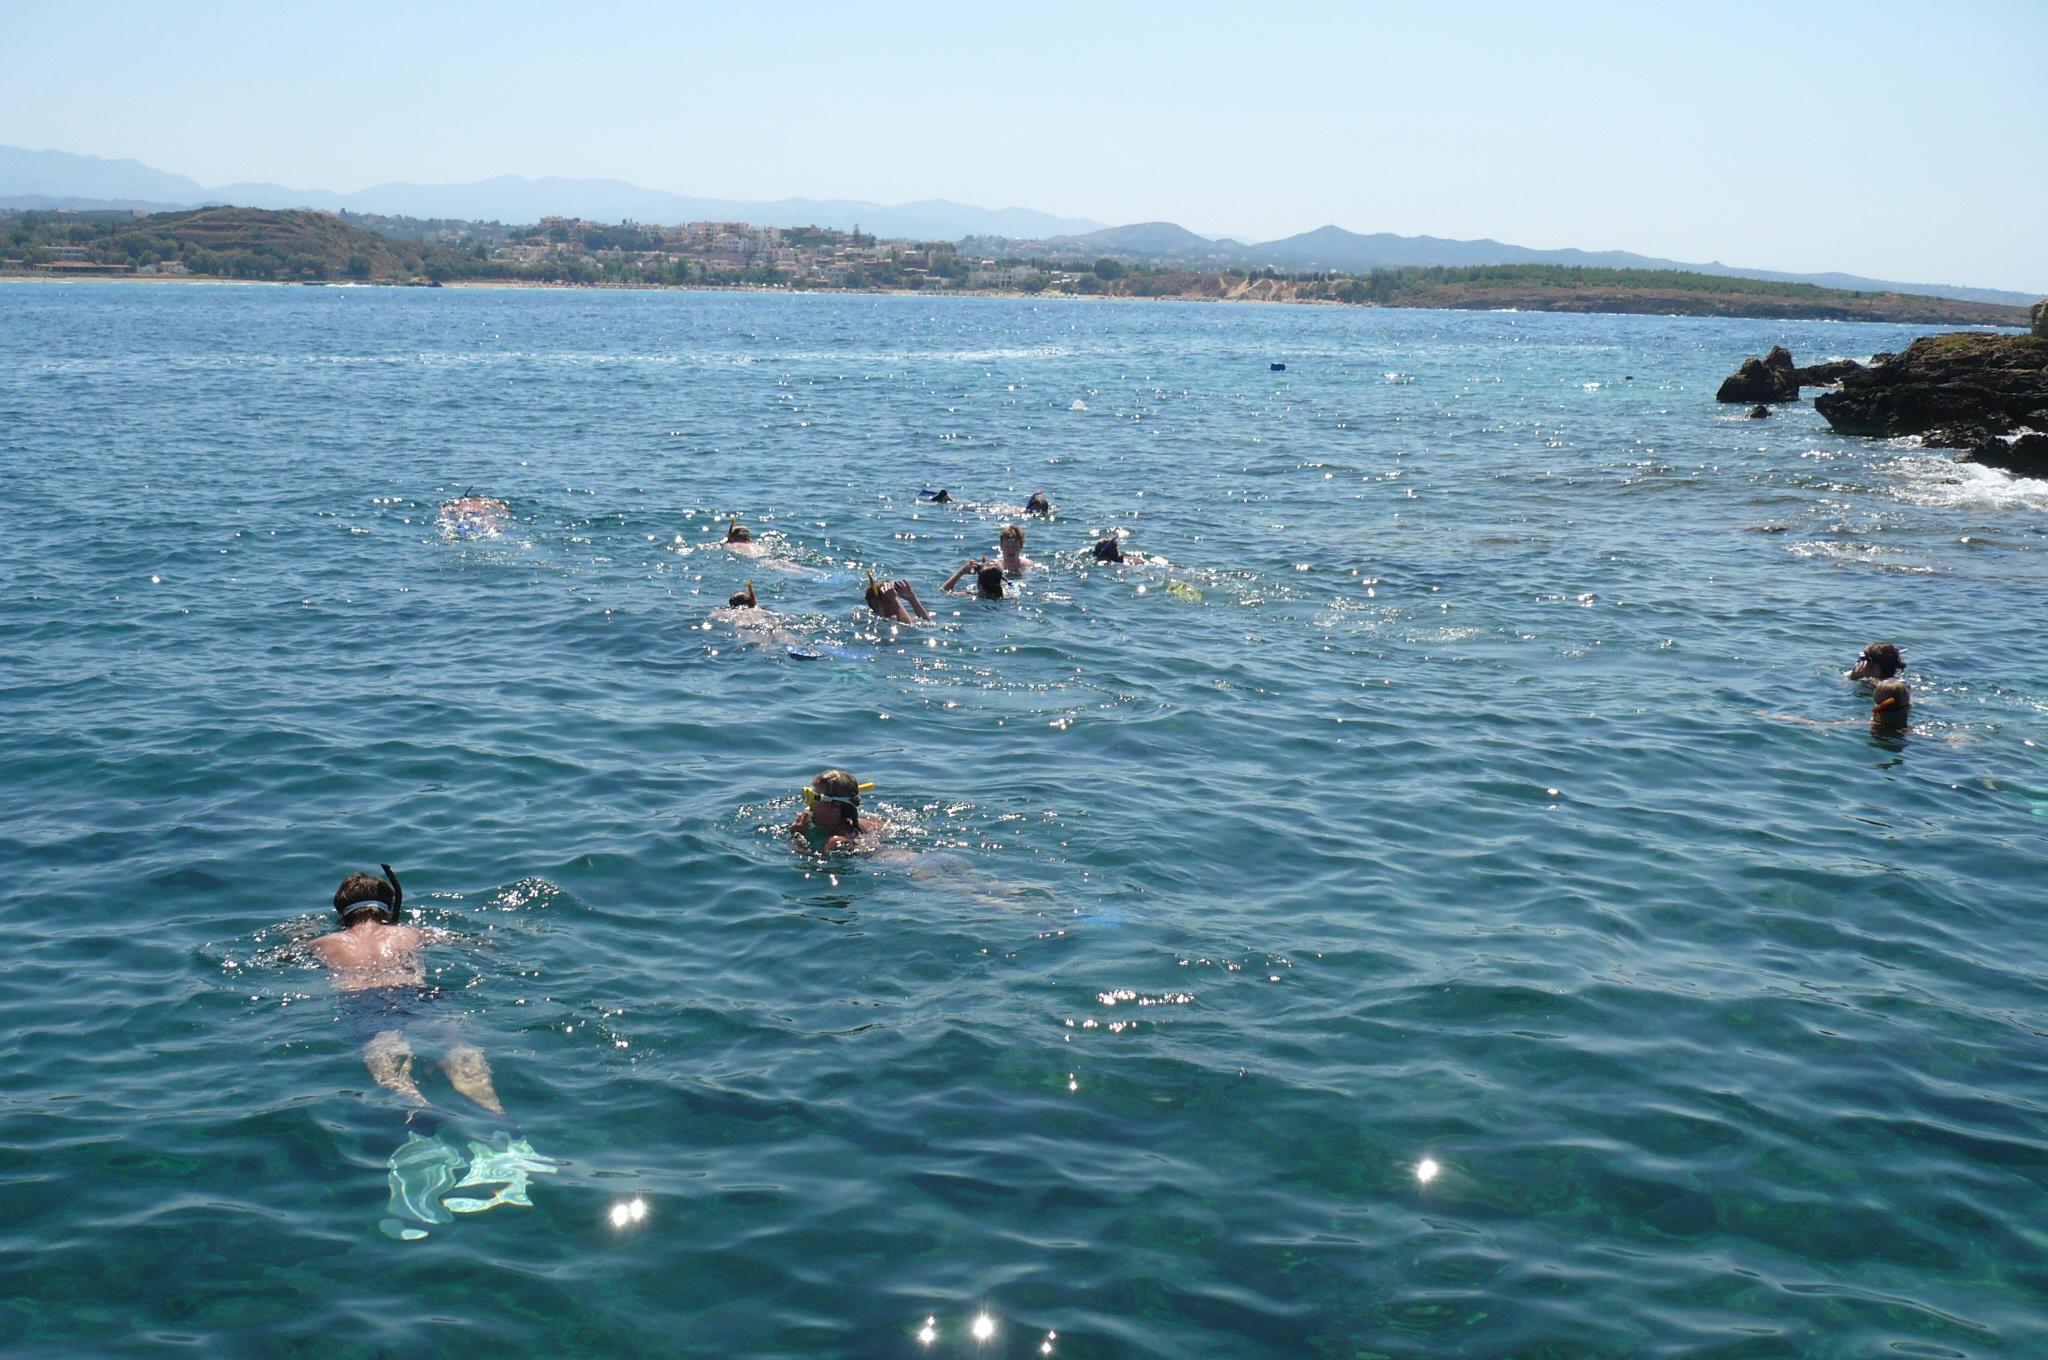 Families swimming in ocean